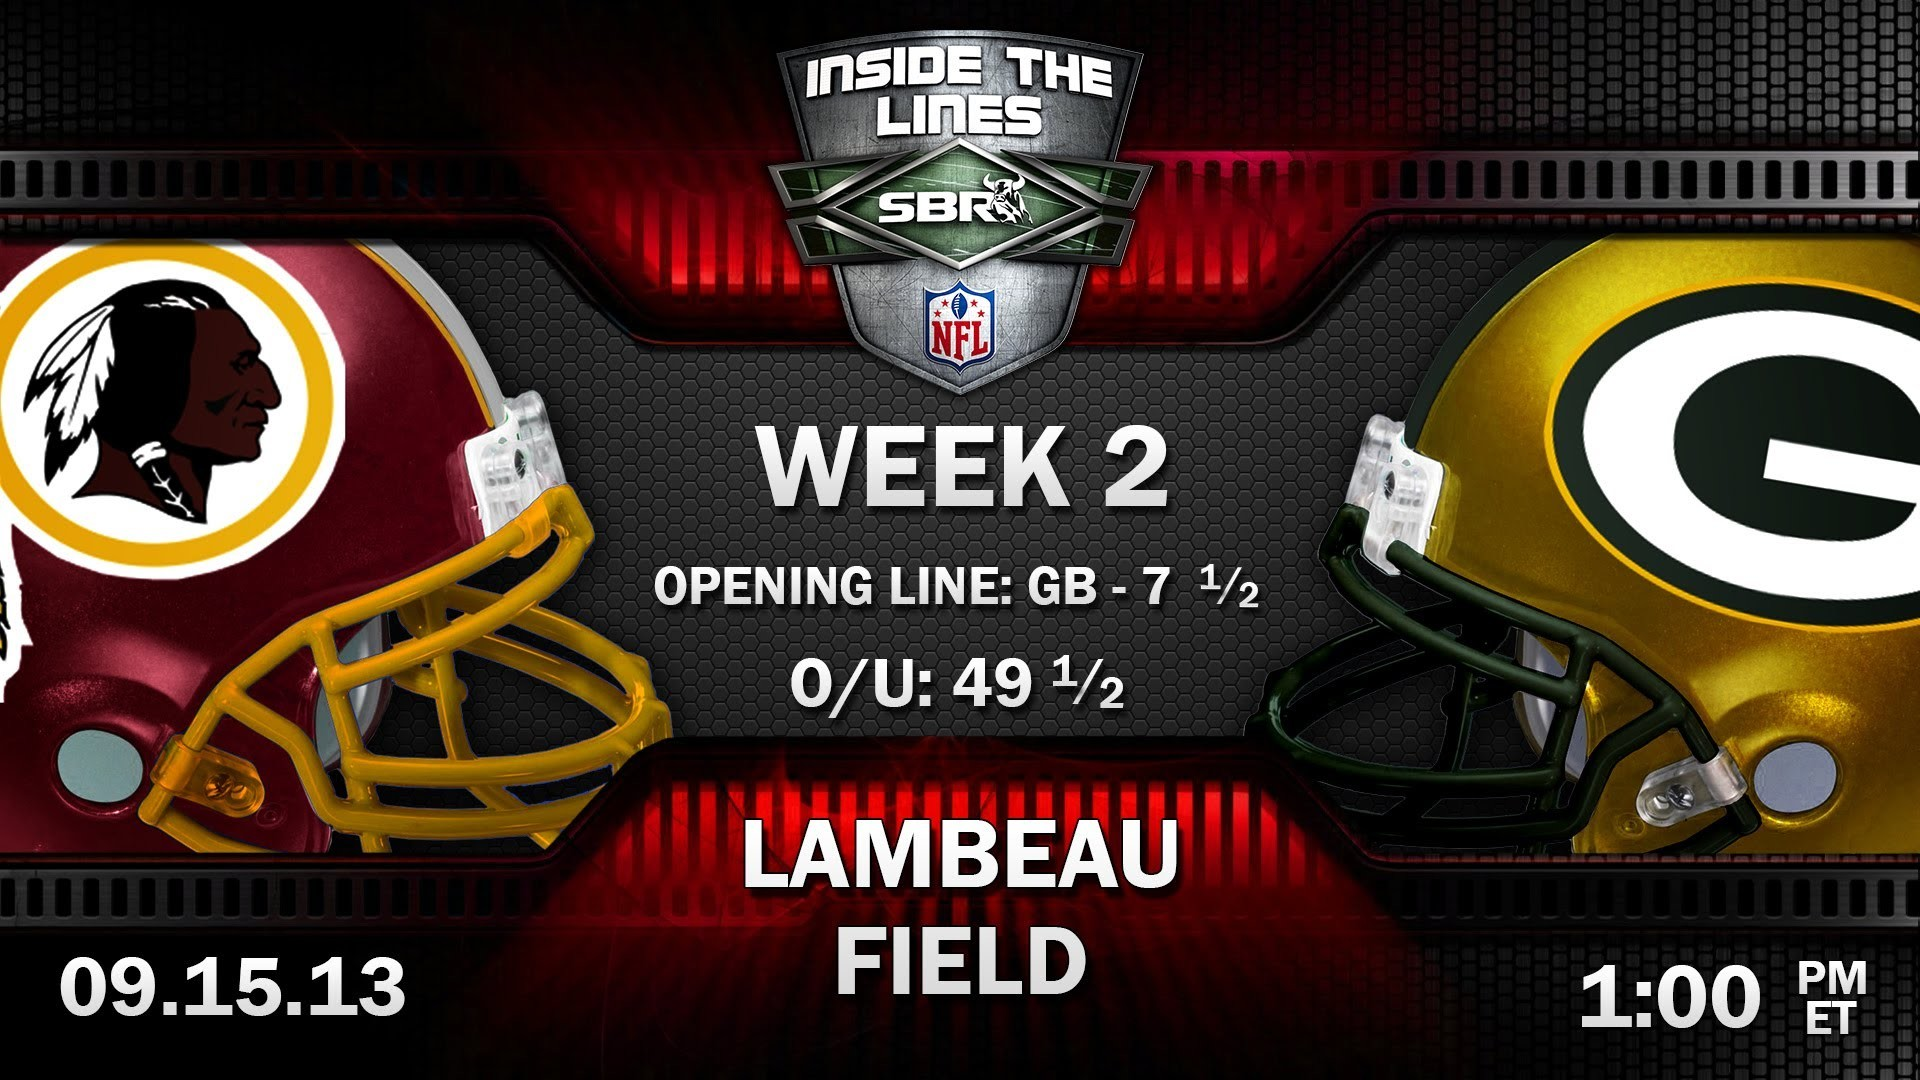 Washington Redskins vs Green Bay Packers NFL Week 2 Preview   2013 NFL  Picks w/ Tony George, Loshak